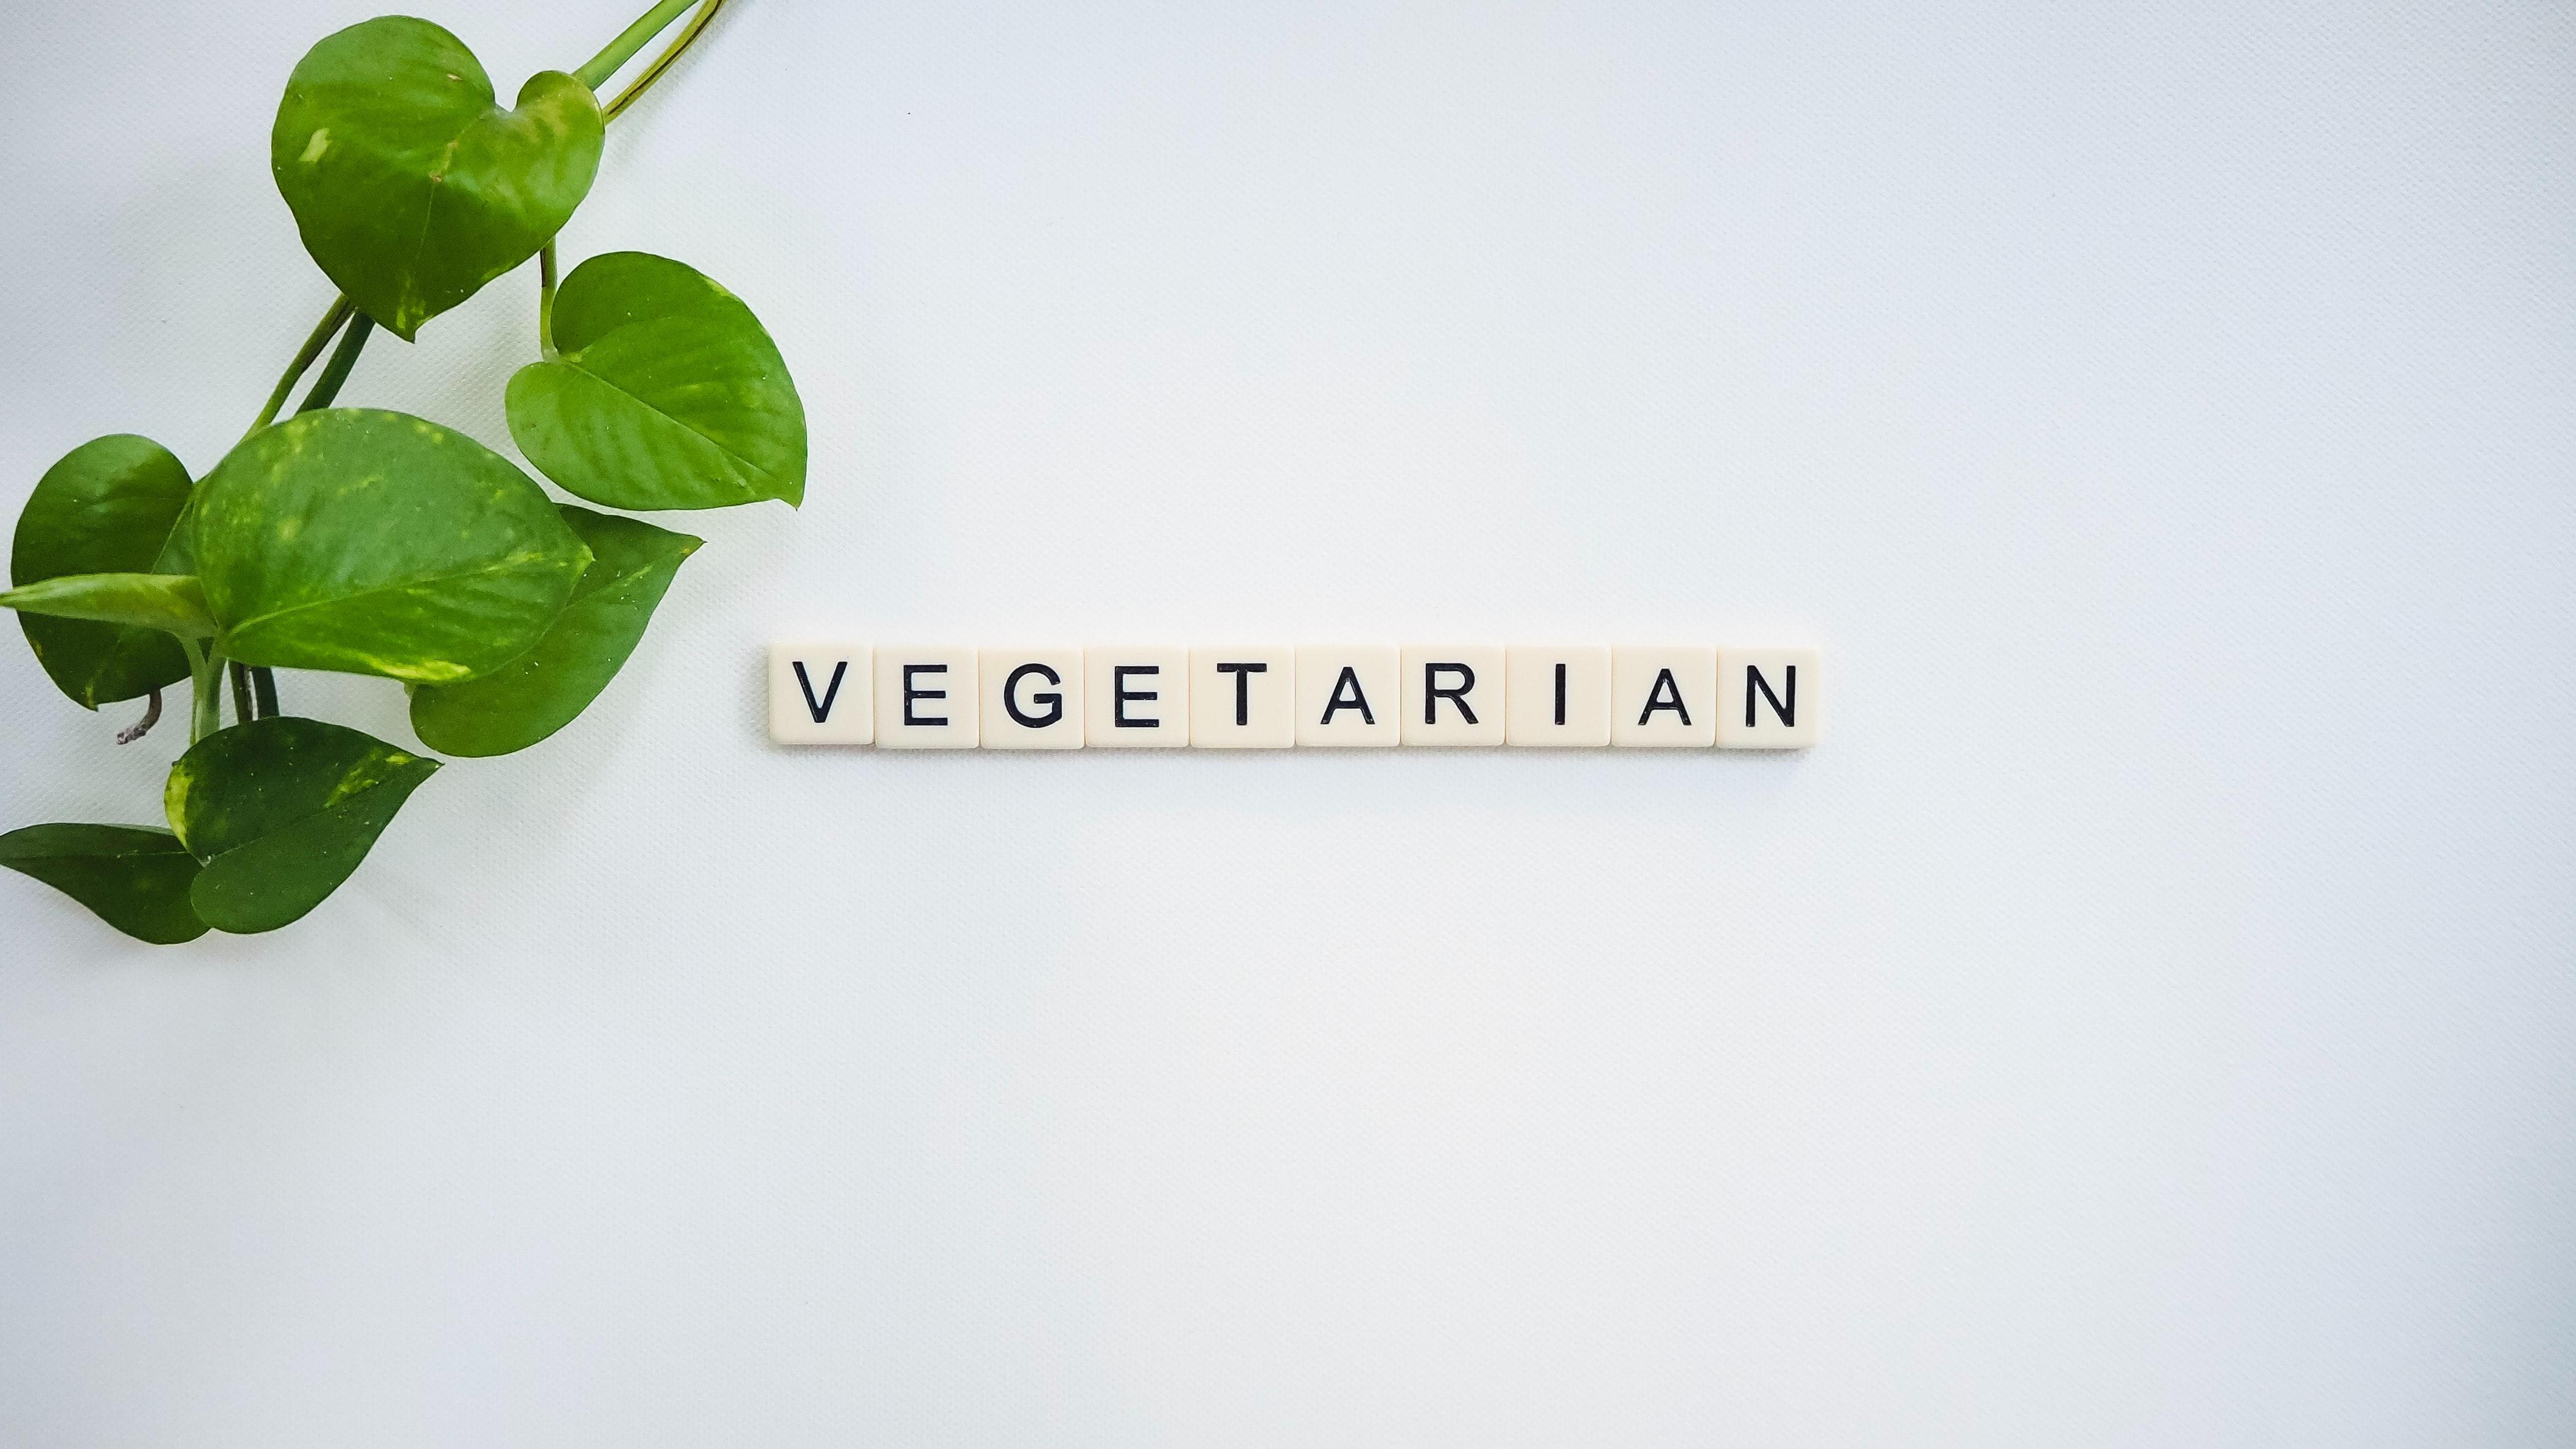 Green Leaf Near White Vegetarian Tile · Free Stock Photo